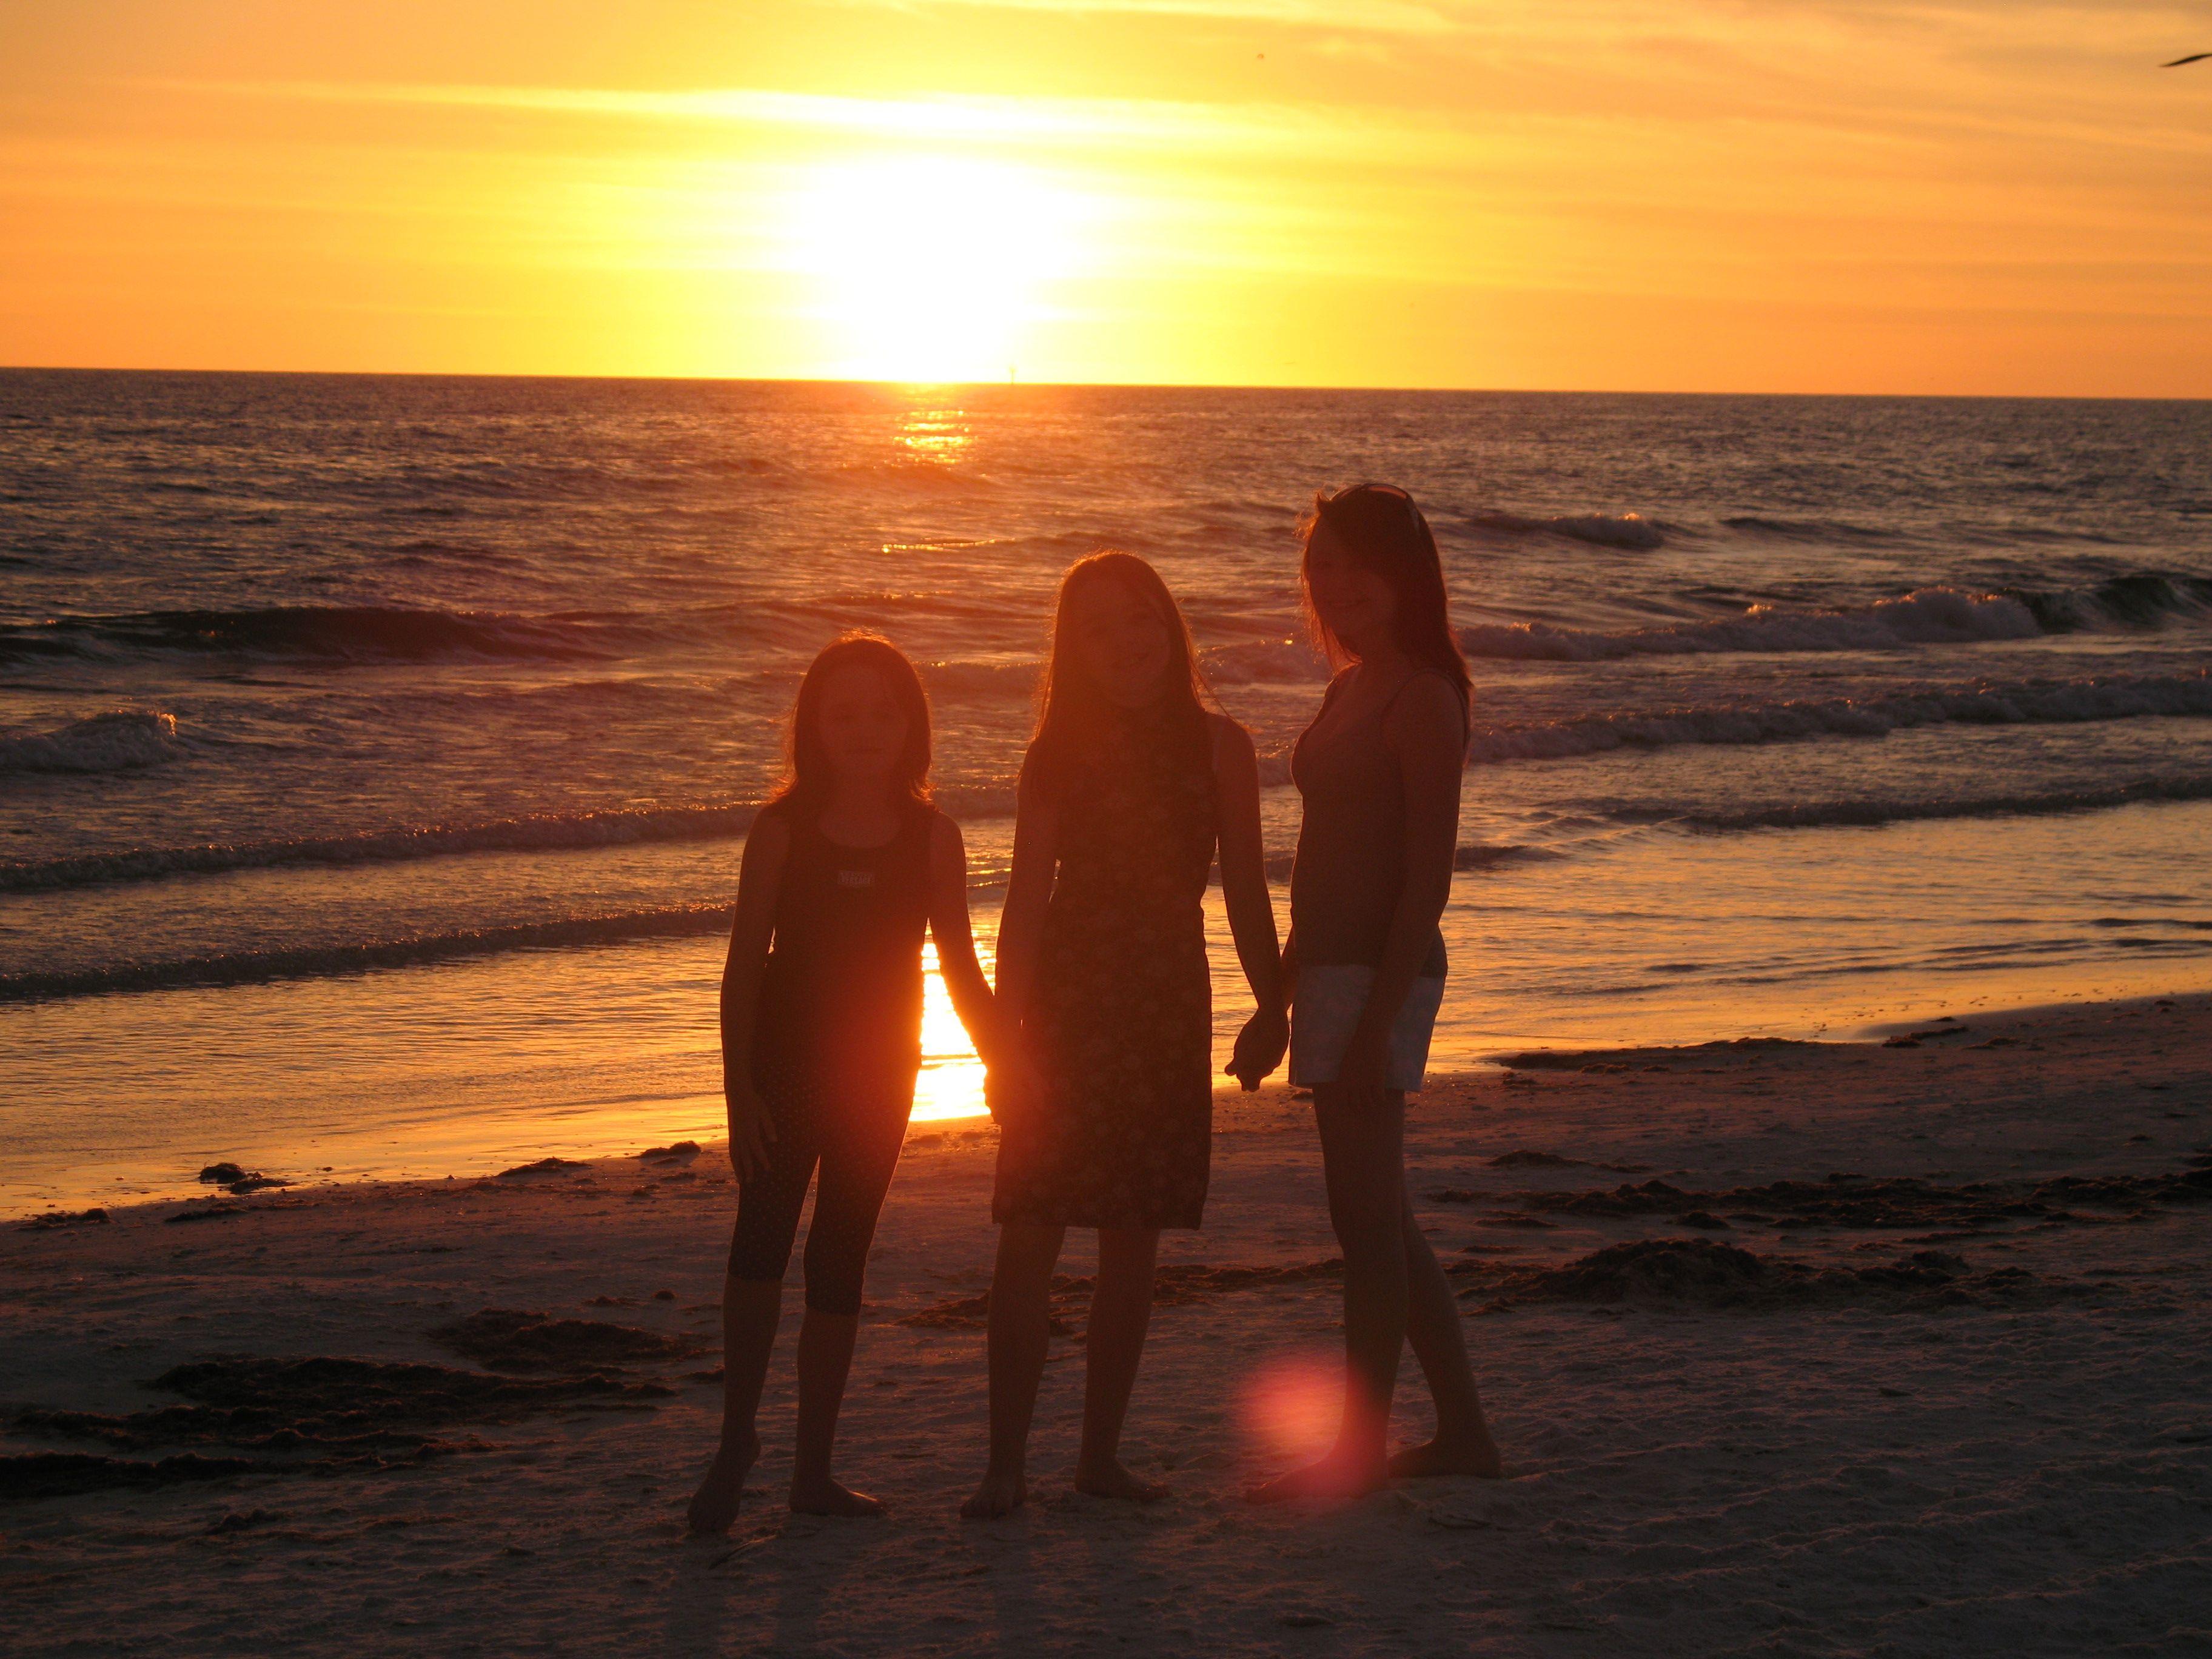 Sunset on Siesta Key #Sunset #Florida